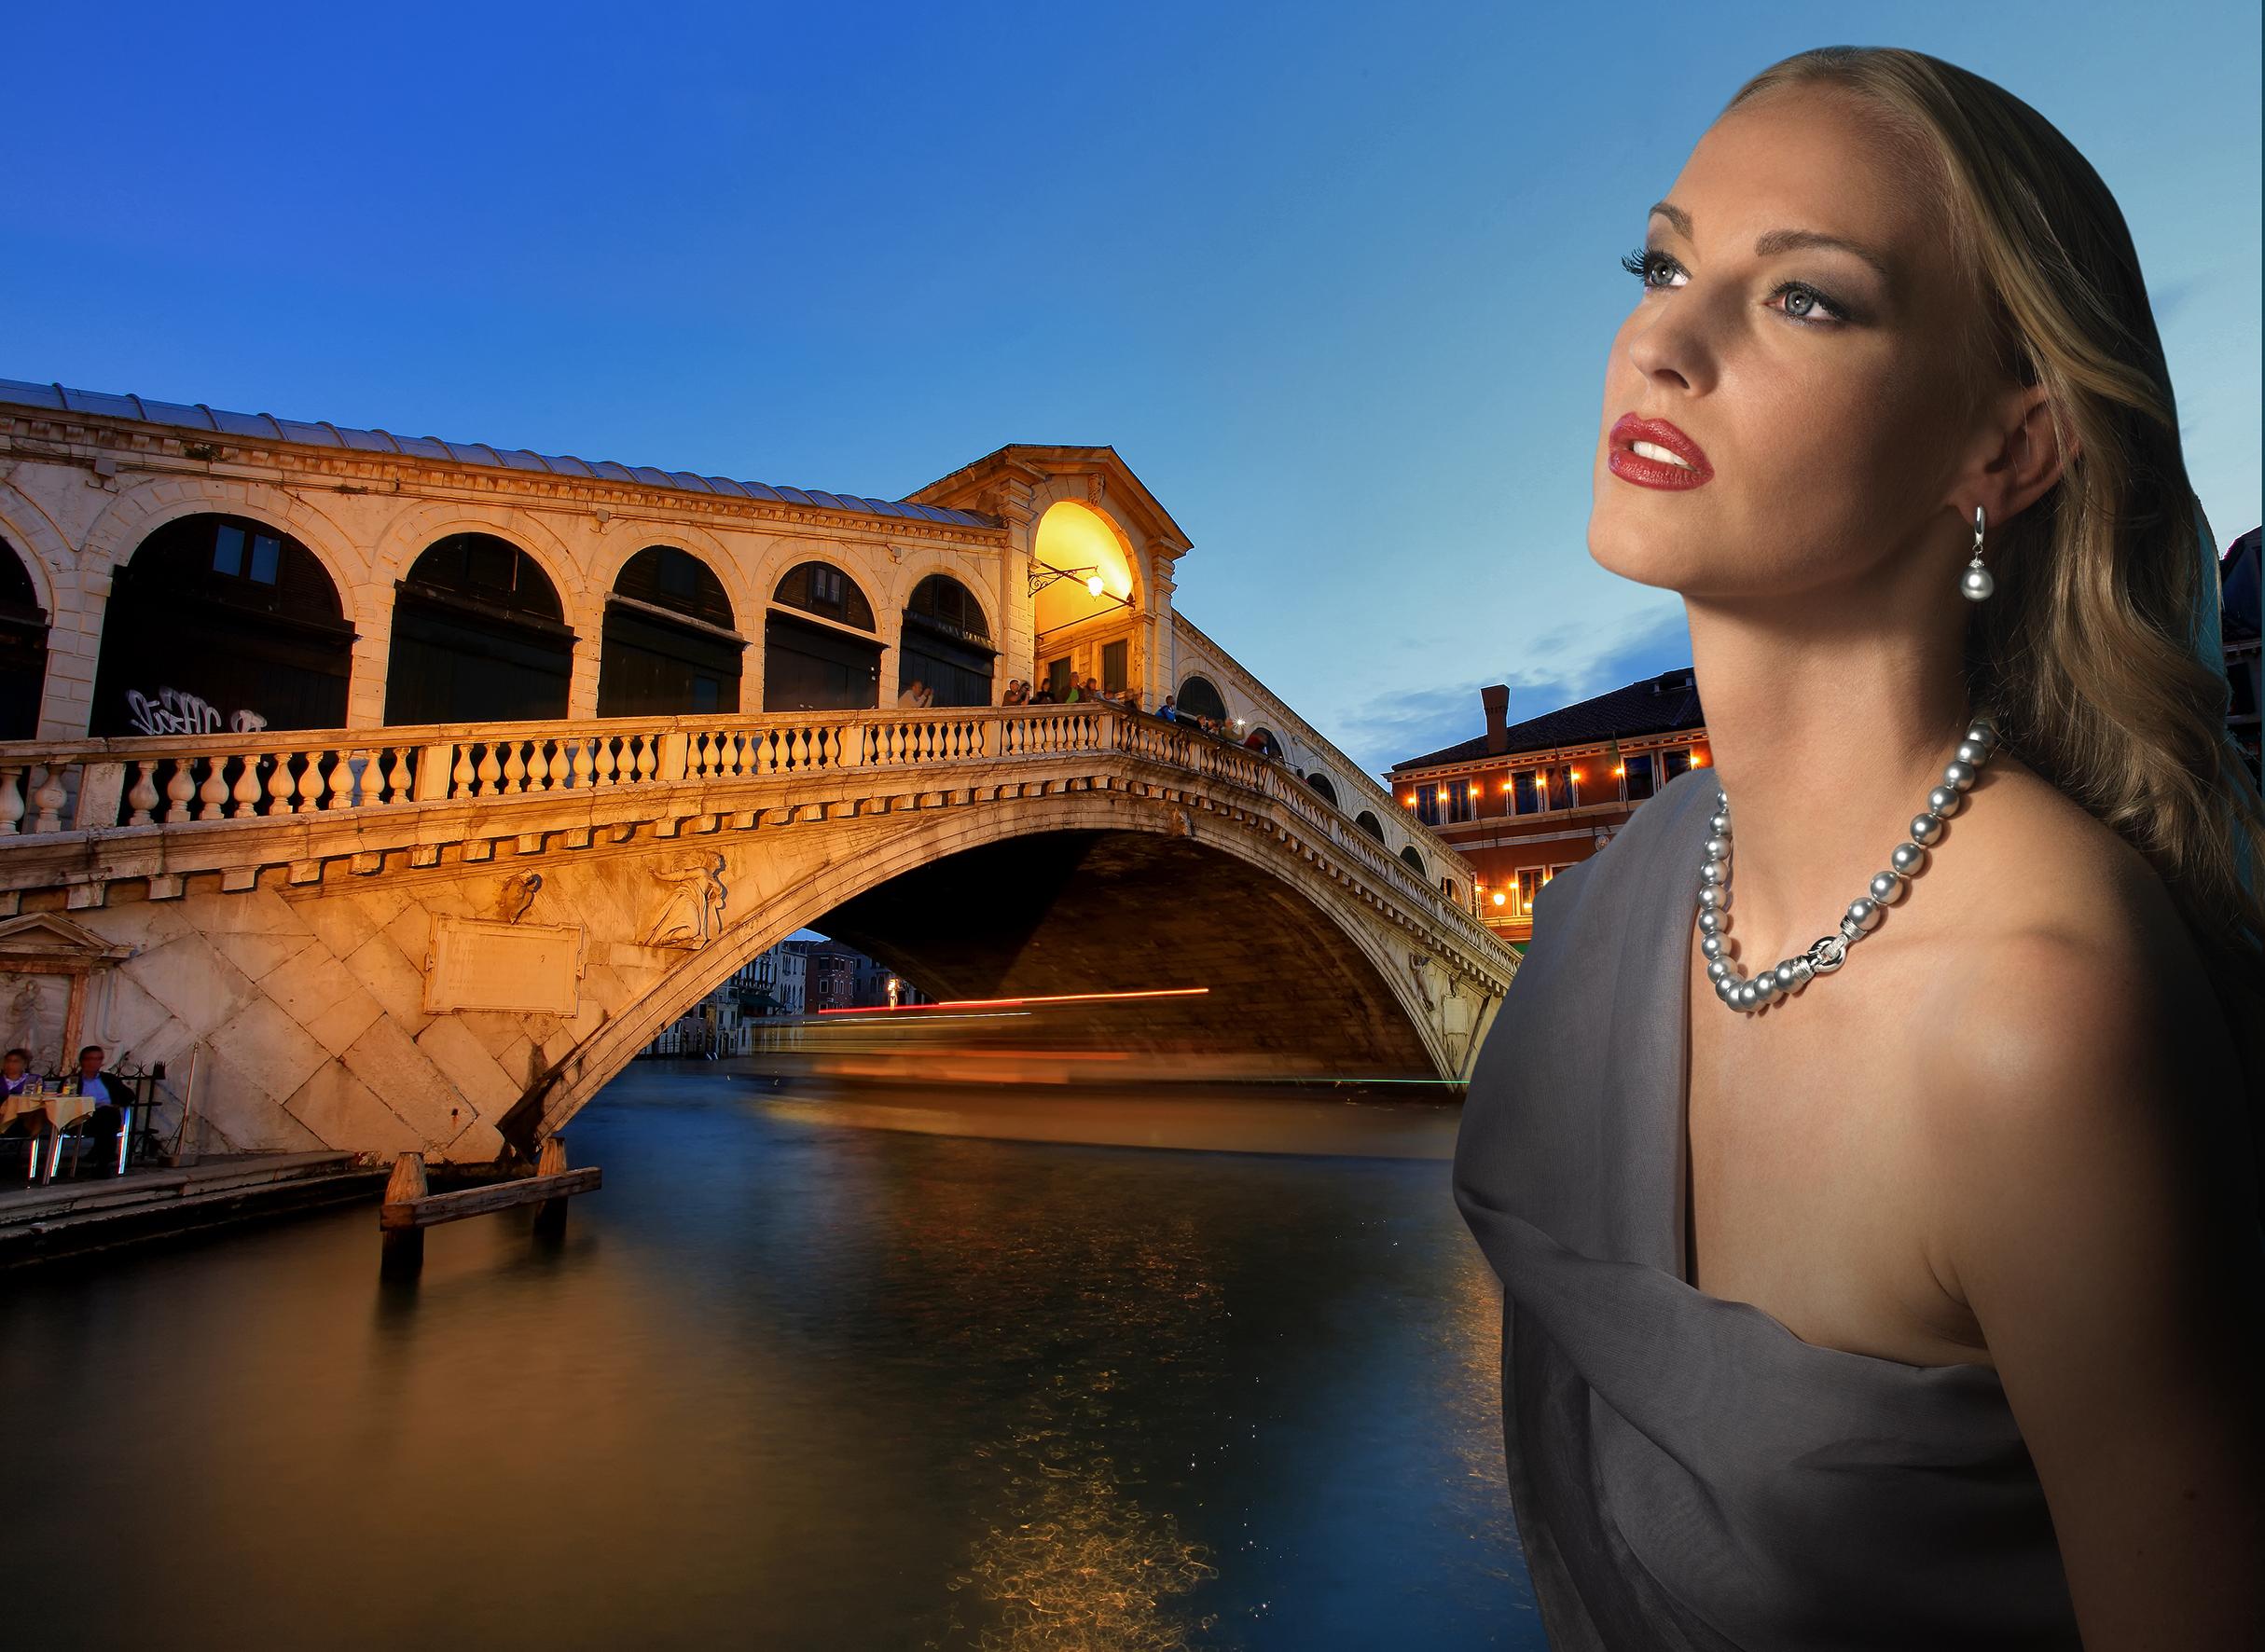 vajenti perle diamanti Venezia